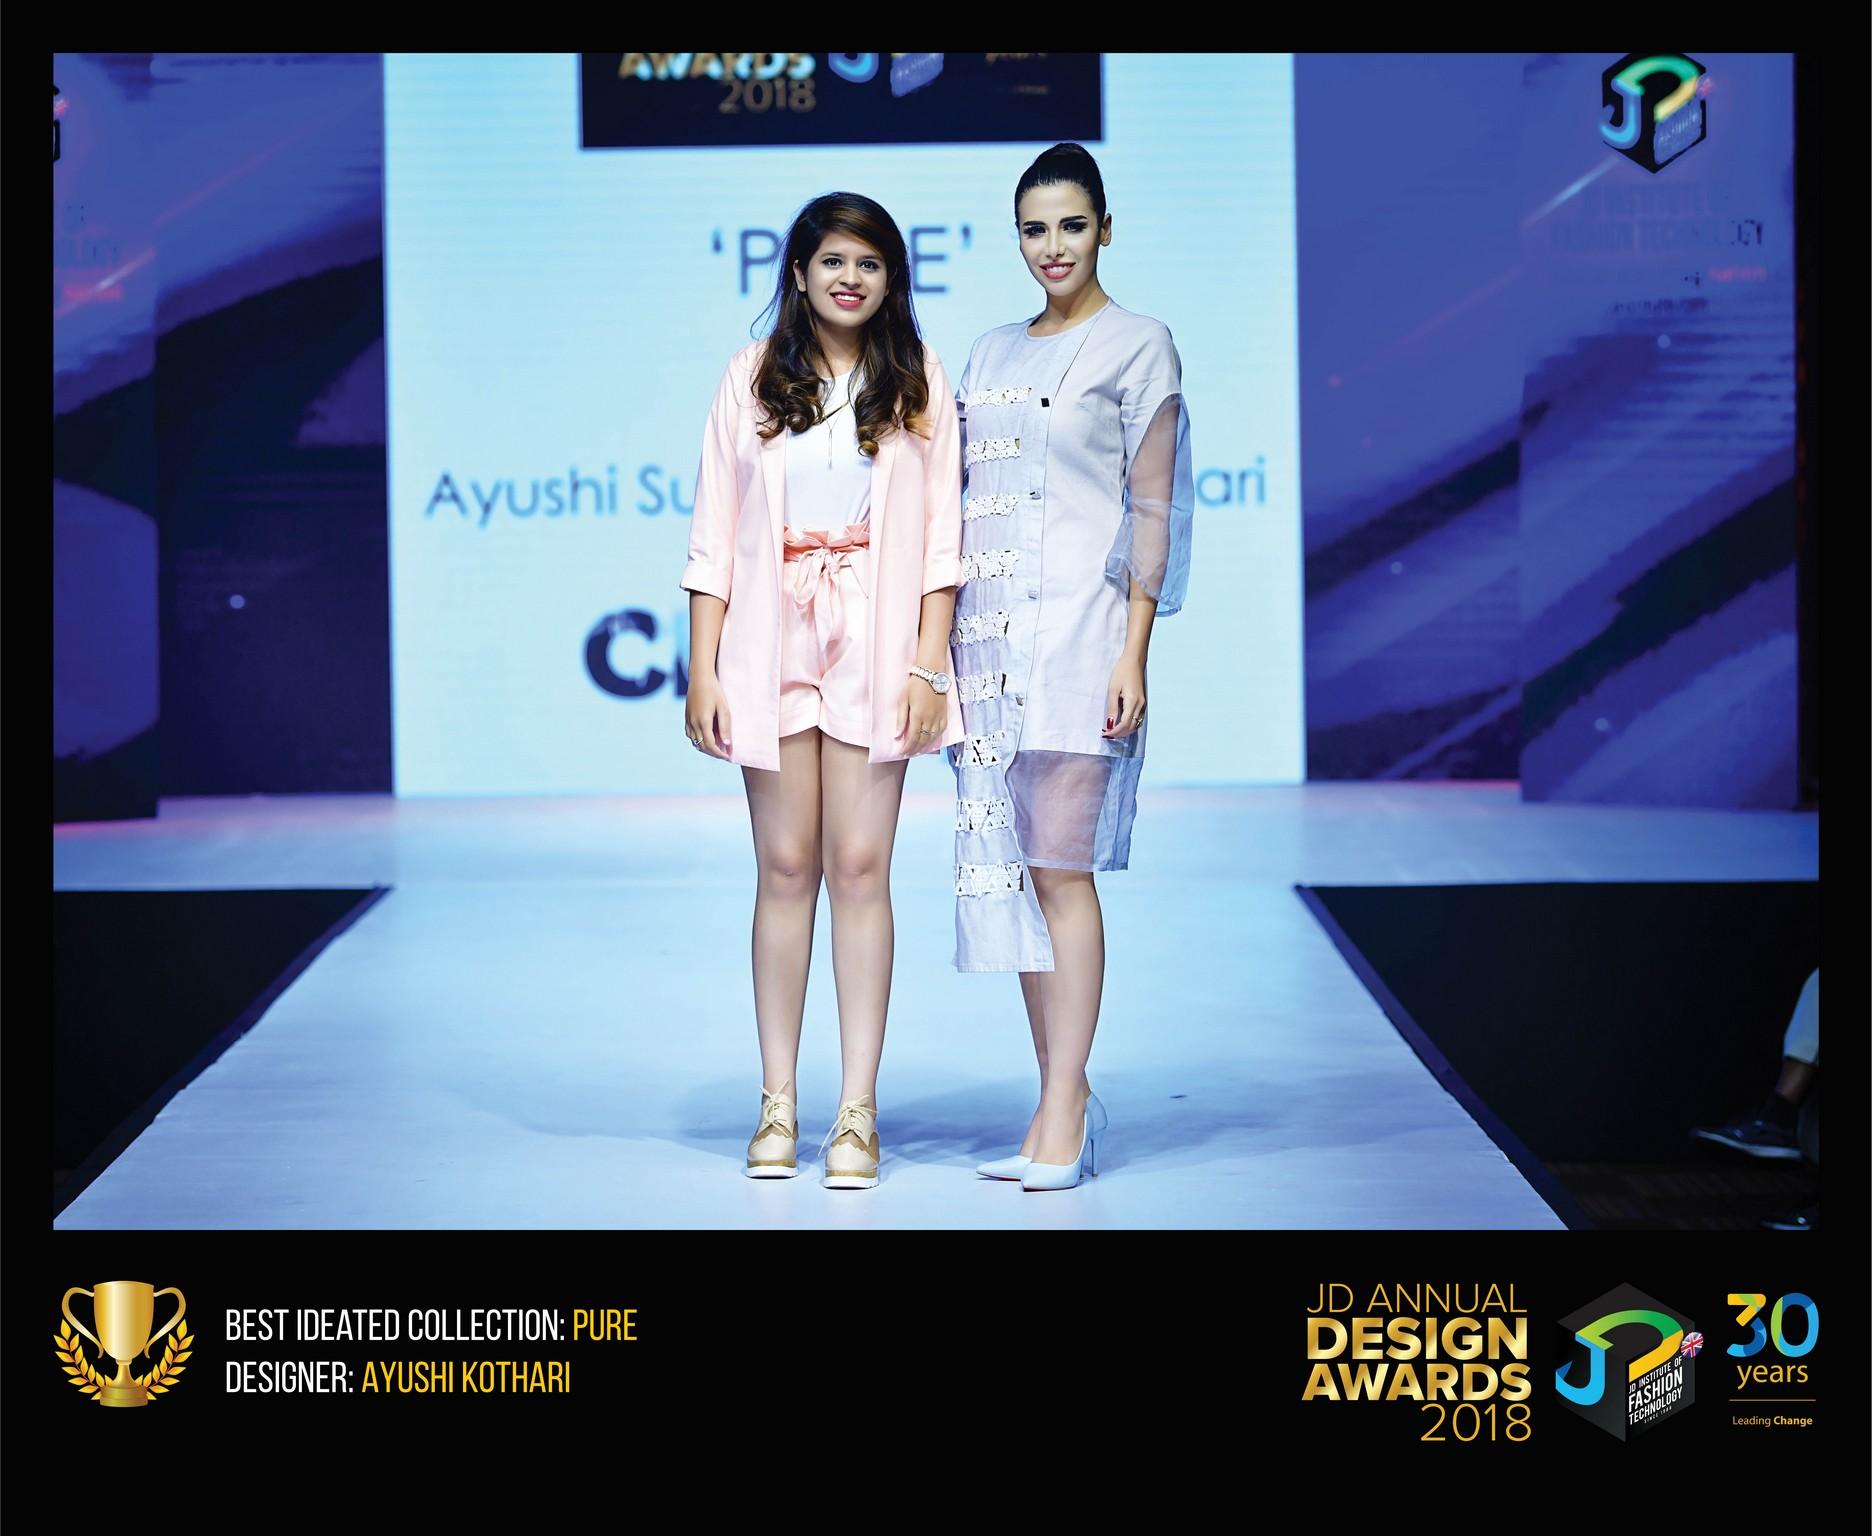 Pure – Change – JD Annual Design Awards 2018 | Designer: Ayushi Kothari (ADFD 2015 Batch) | Photography : Jerin Nath (@jerin_nath) pure - Pure14 Final - Pure – Change – JD Annual Design Awards 2018